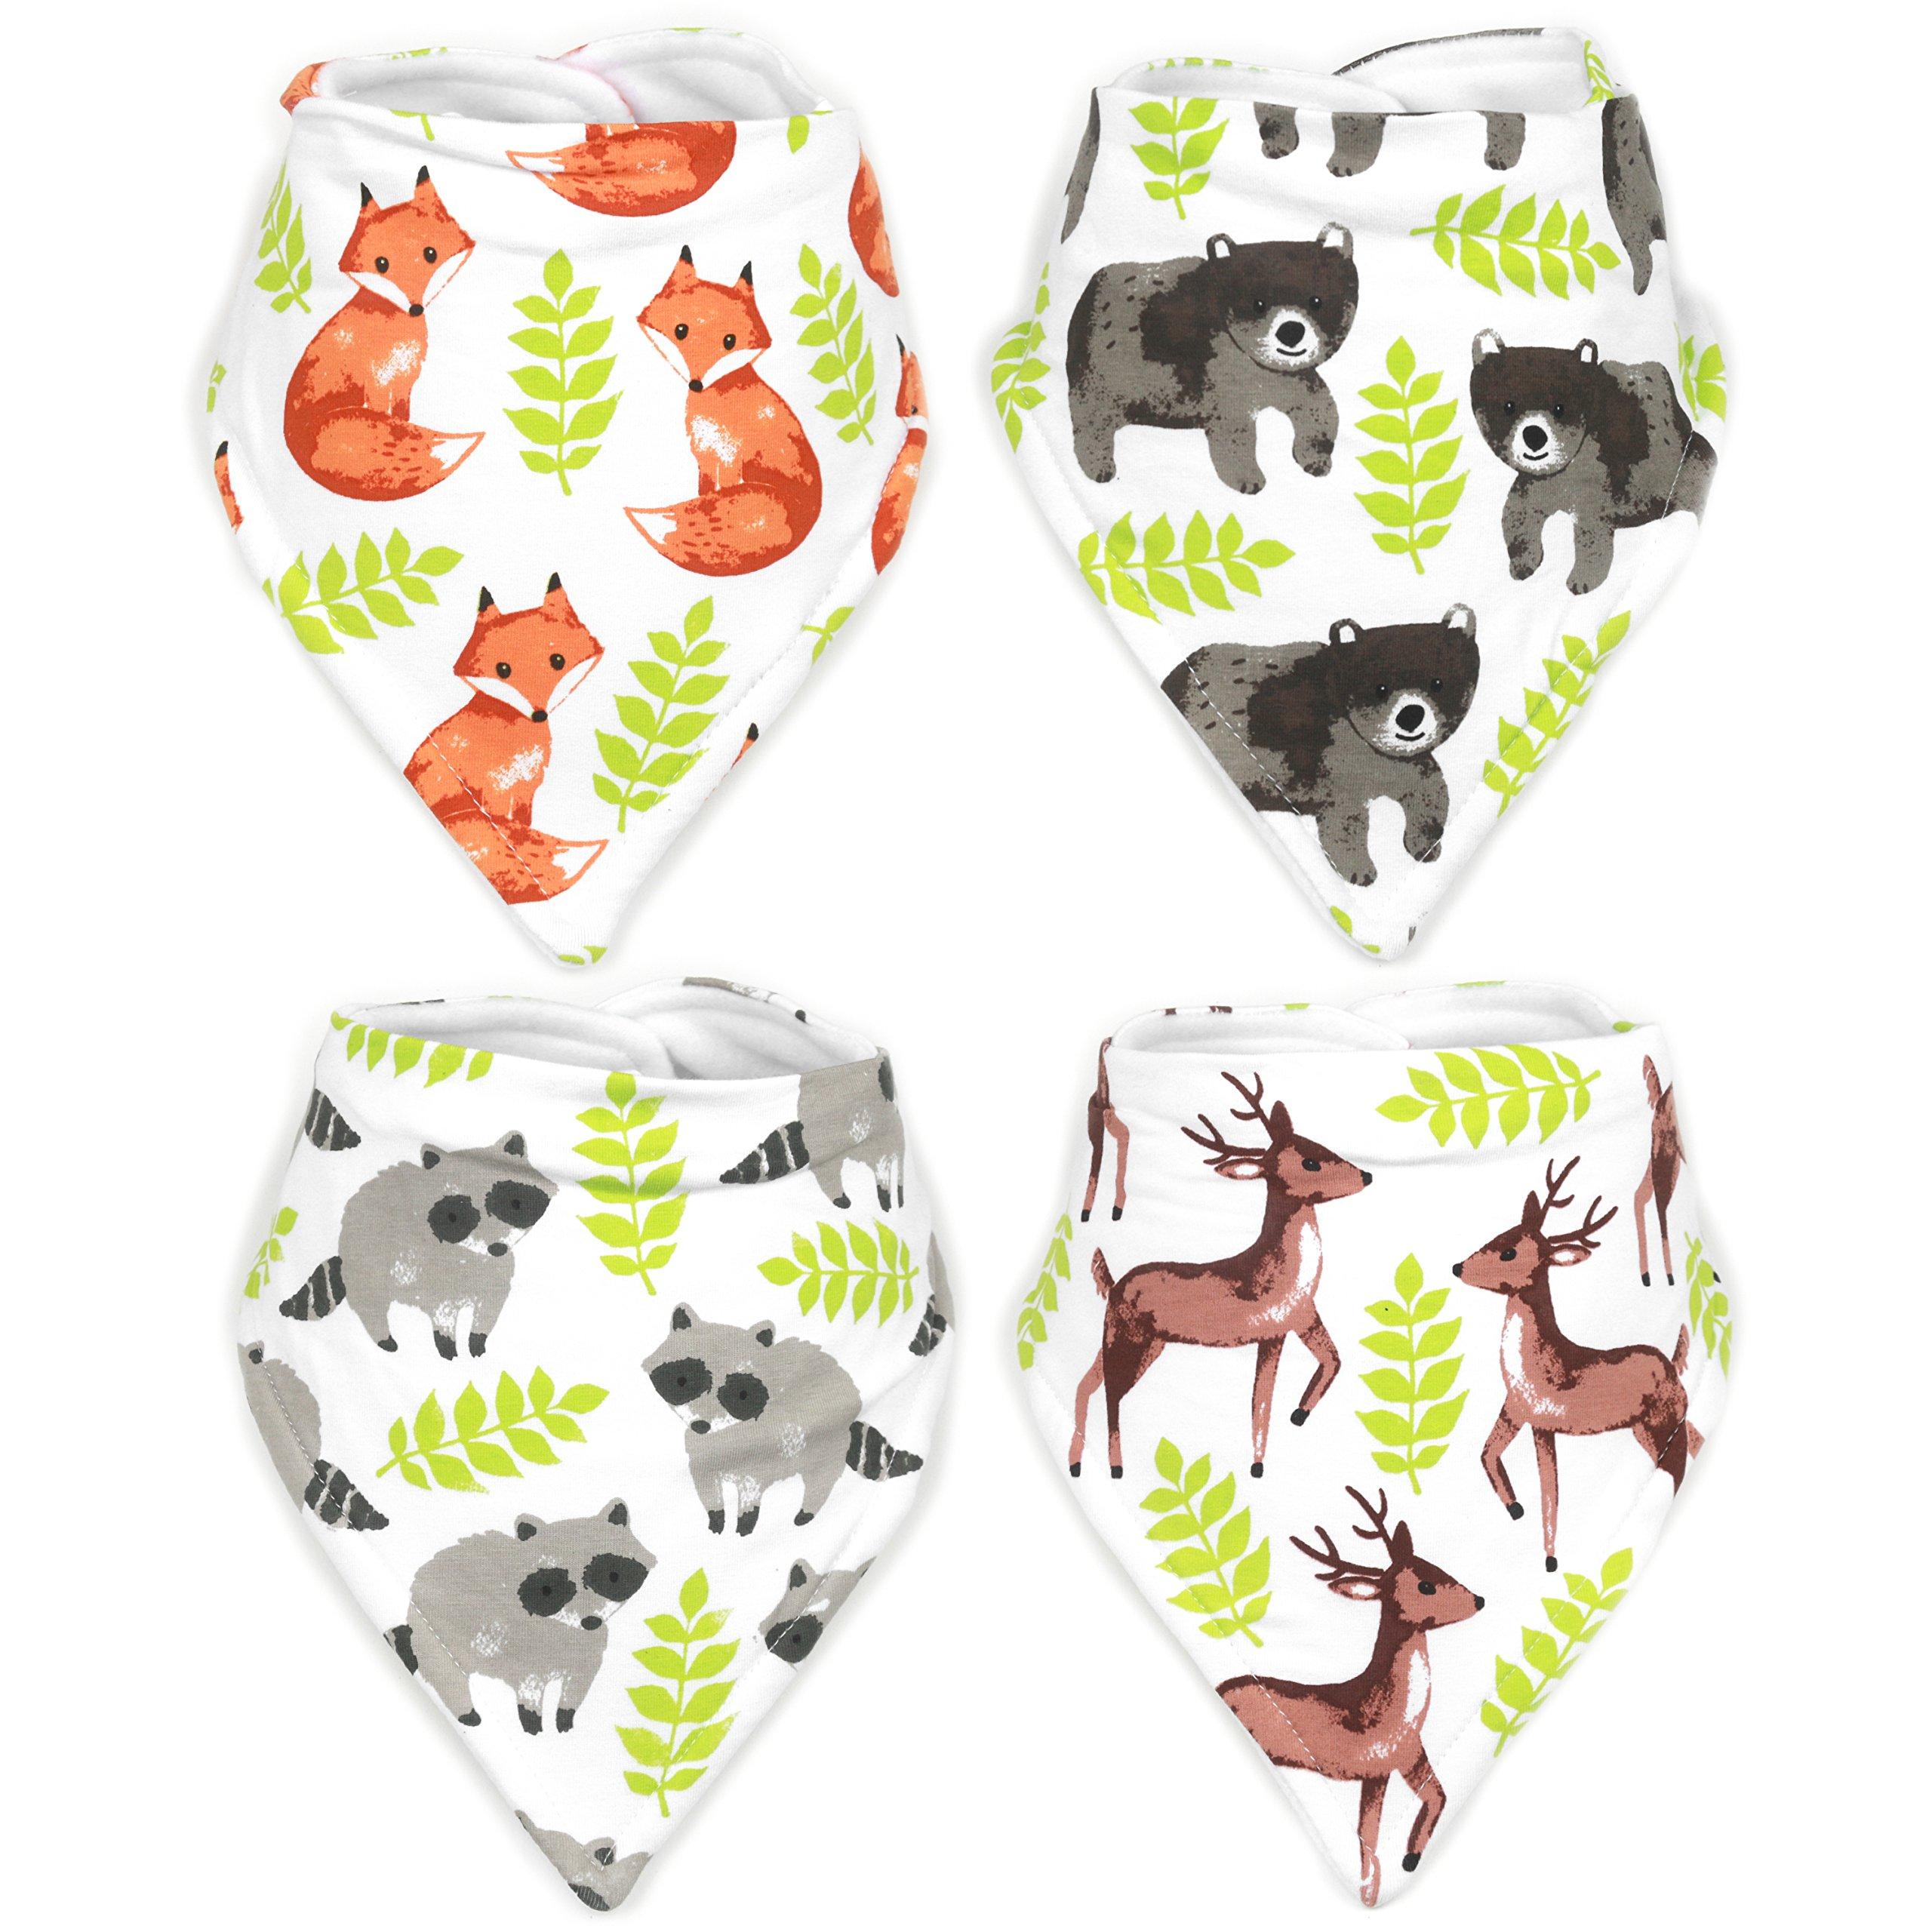 Stadela Baby Adjustable Bandana Drool Bibs for Drooling and Teething Nursery Burp Cloths 4 Pack Unisex Baby Shower Gift Set for Girl and Boy – Enchanted Forest Woodland Animal Fox Bear Deer Raccoon